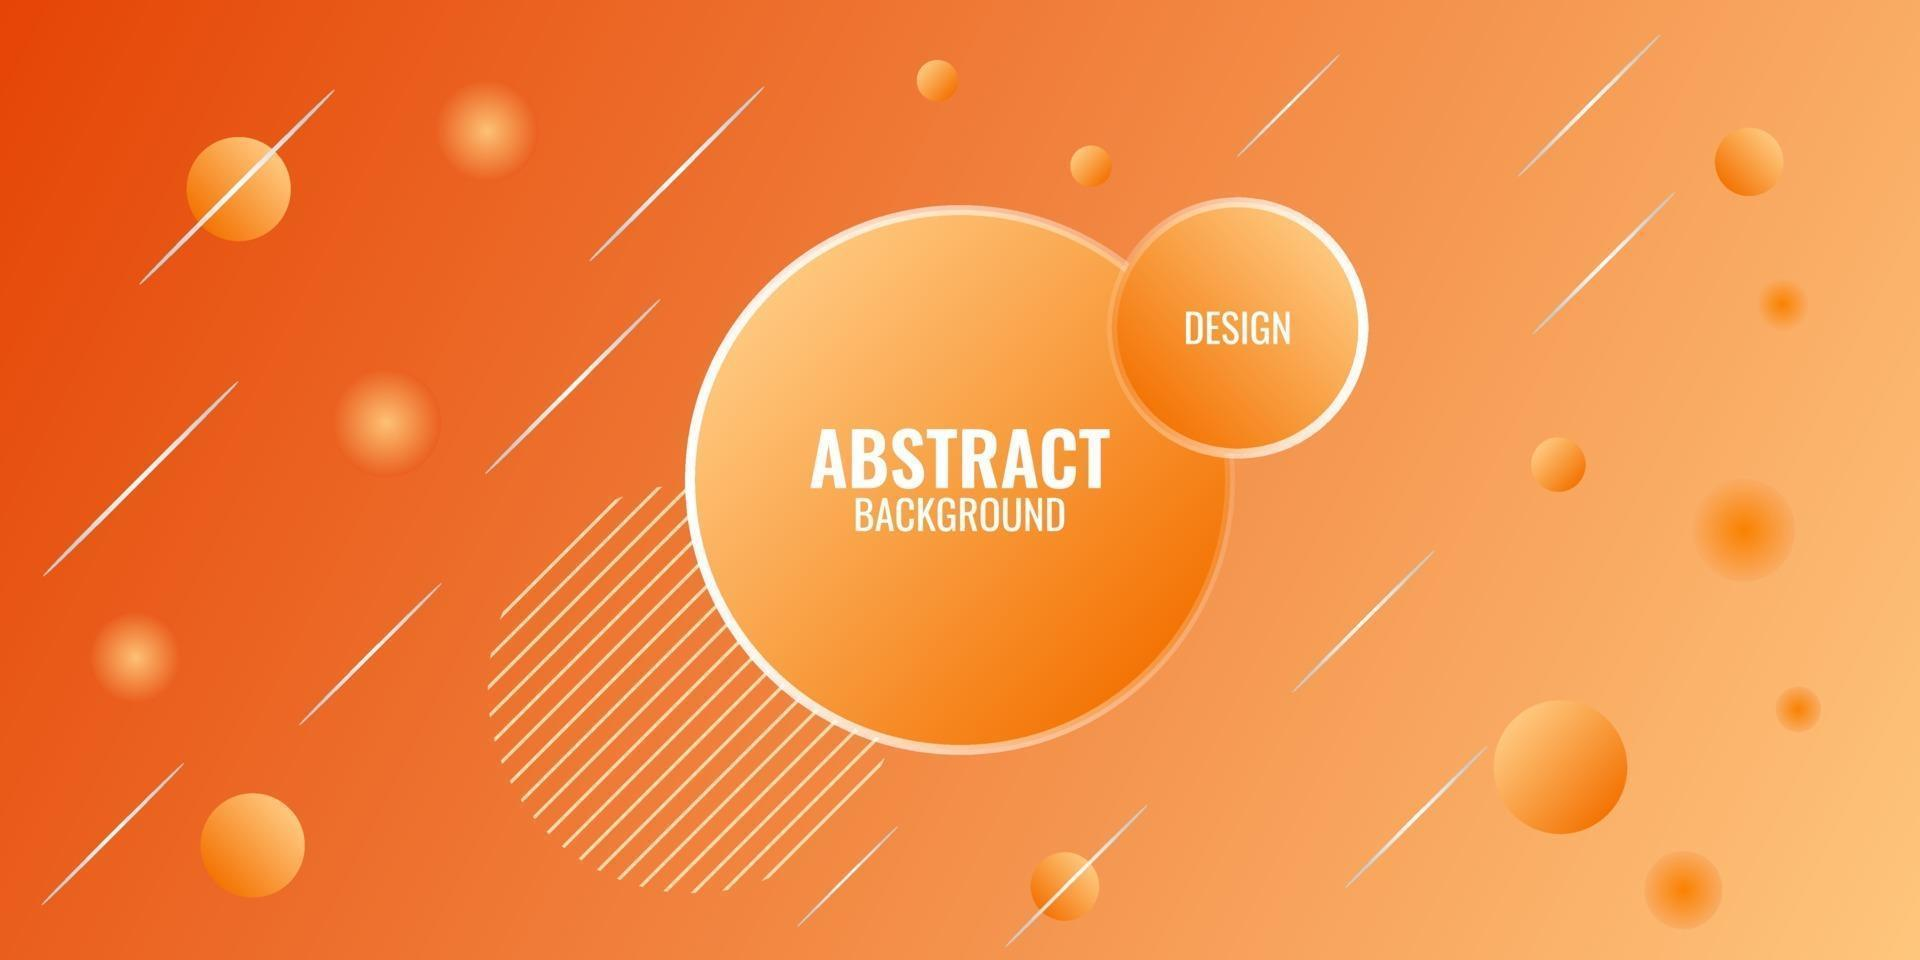 moderno abstracto naranja degradado geométrico vector